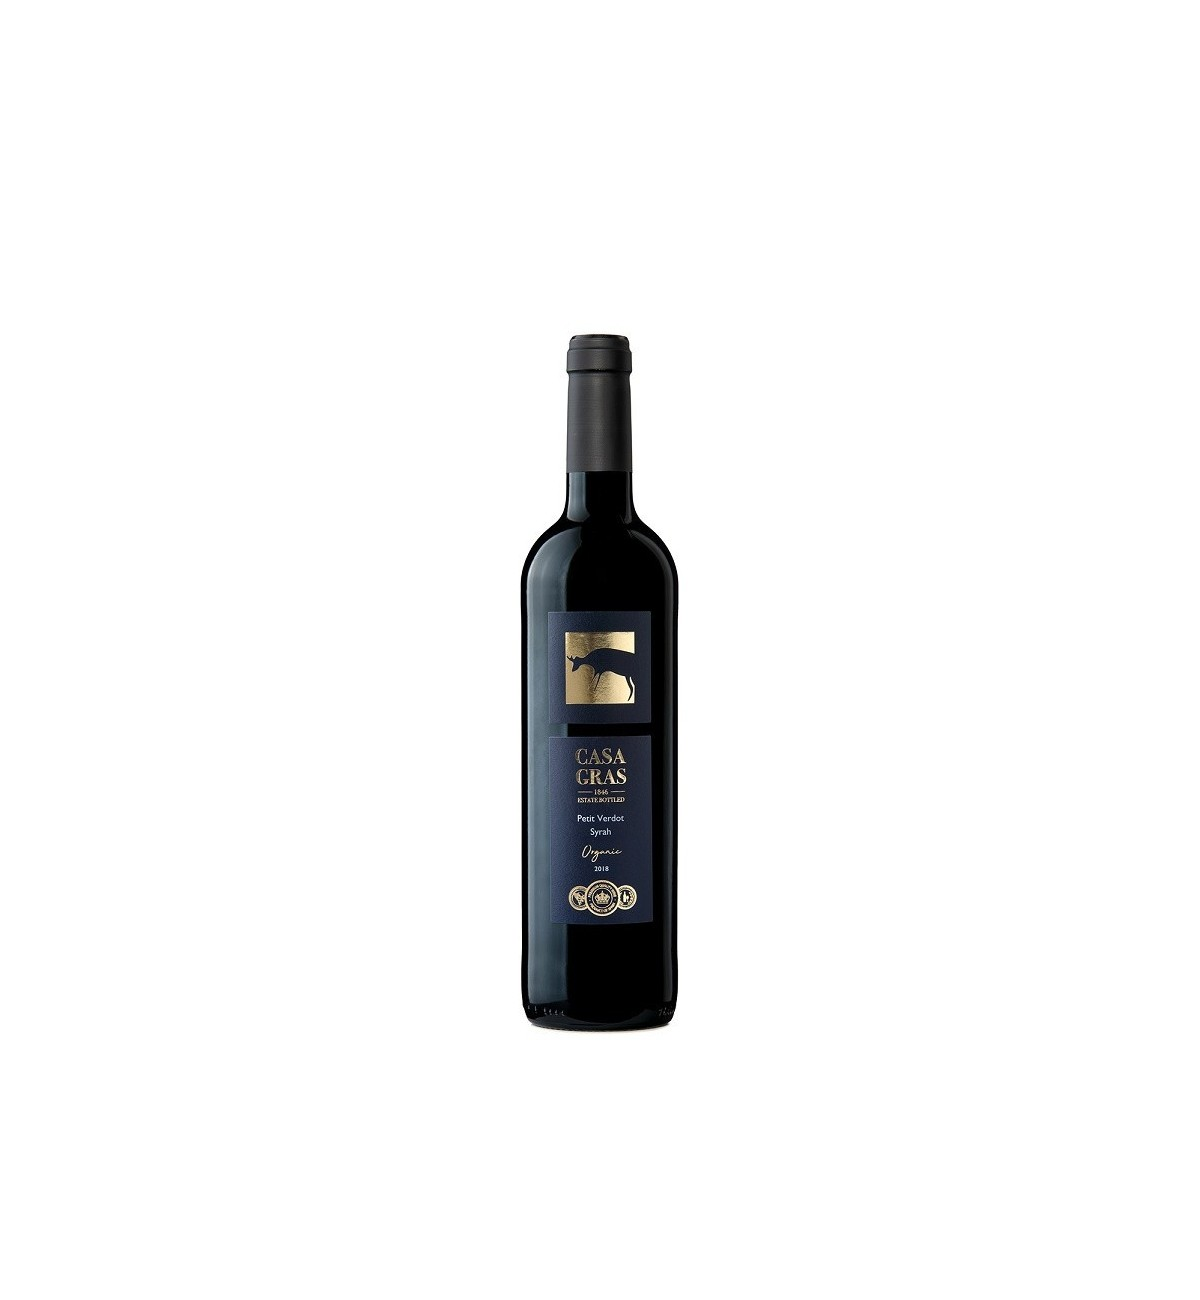 Casa Gras Monastrell Petit Verdot Cabernet Sauvignon 2018 * Yecla, Vino tinto,  ecológico, vegano, Casa de las Especias